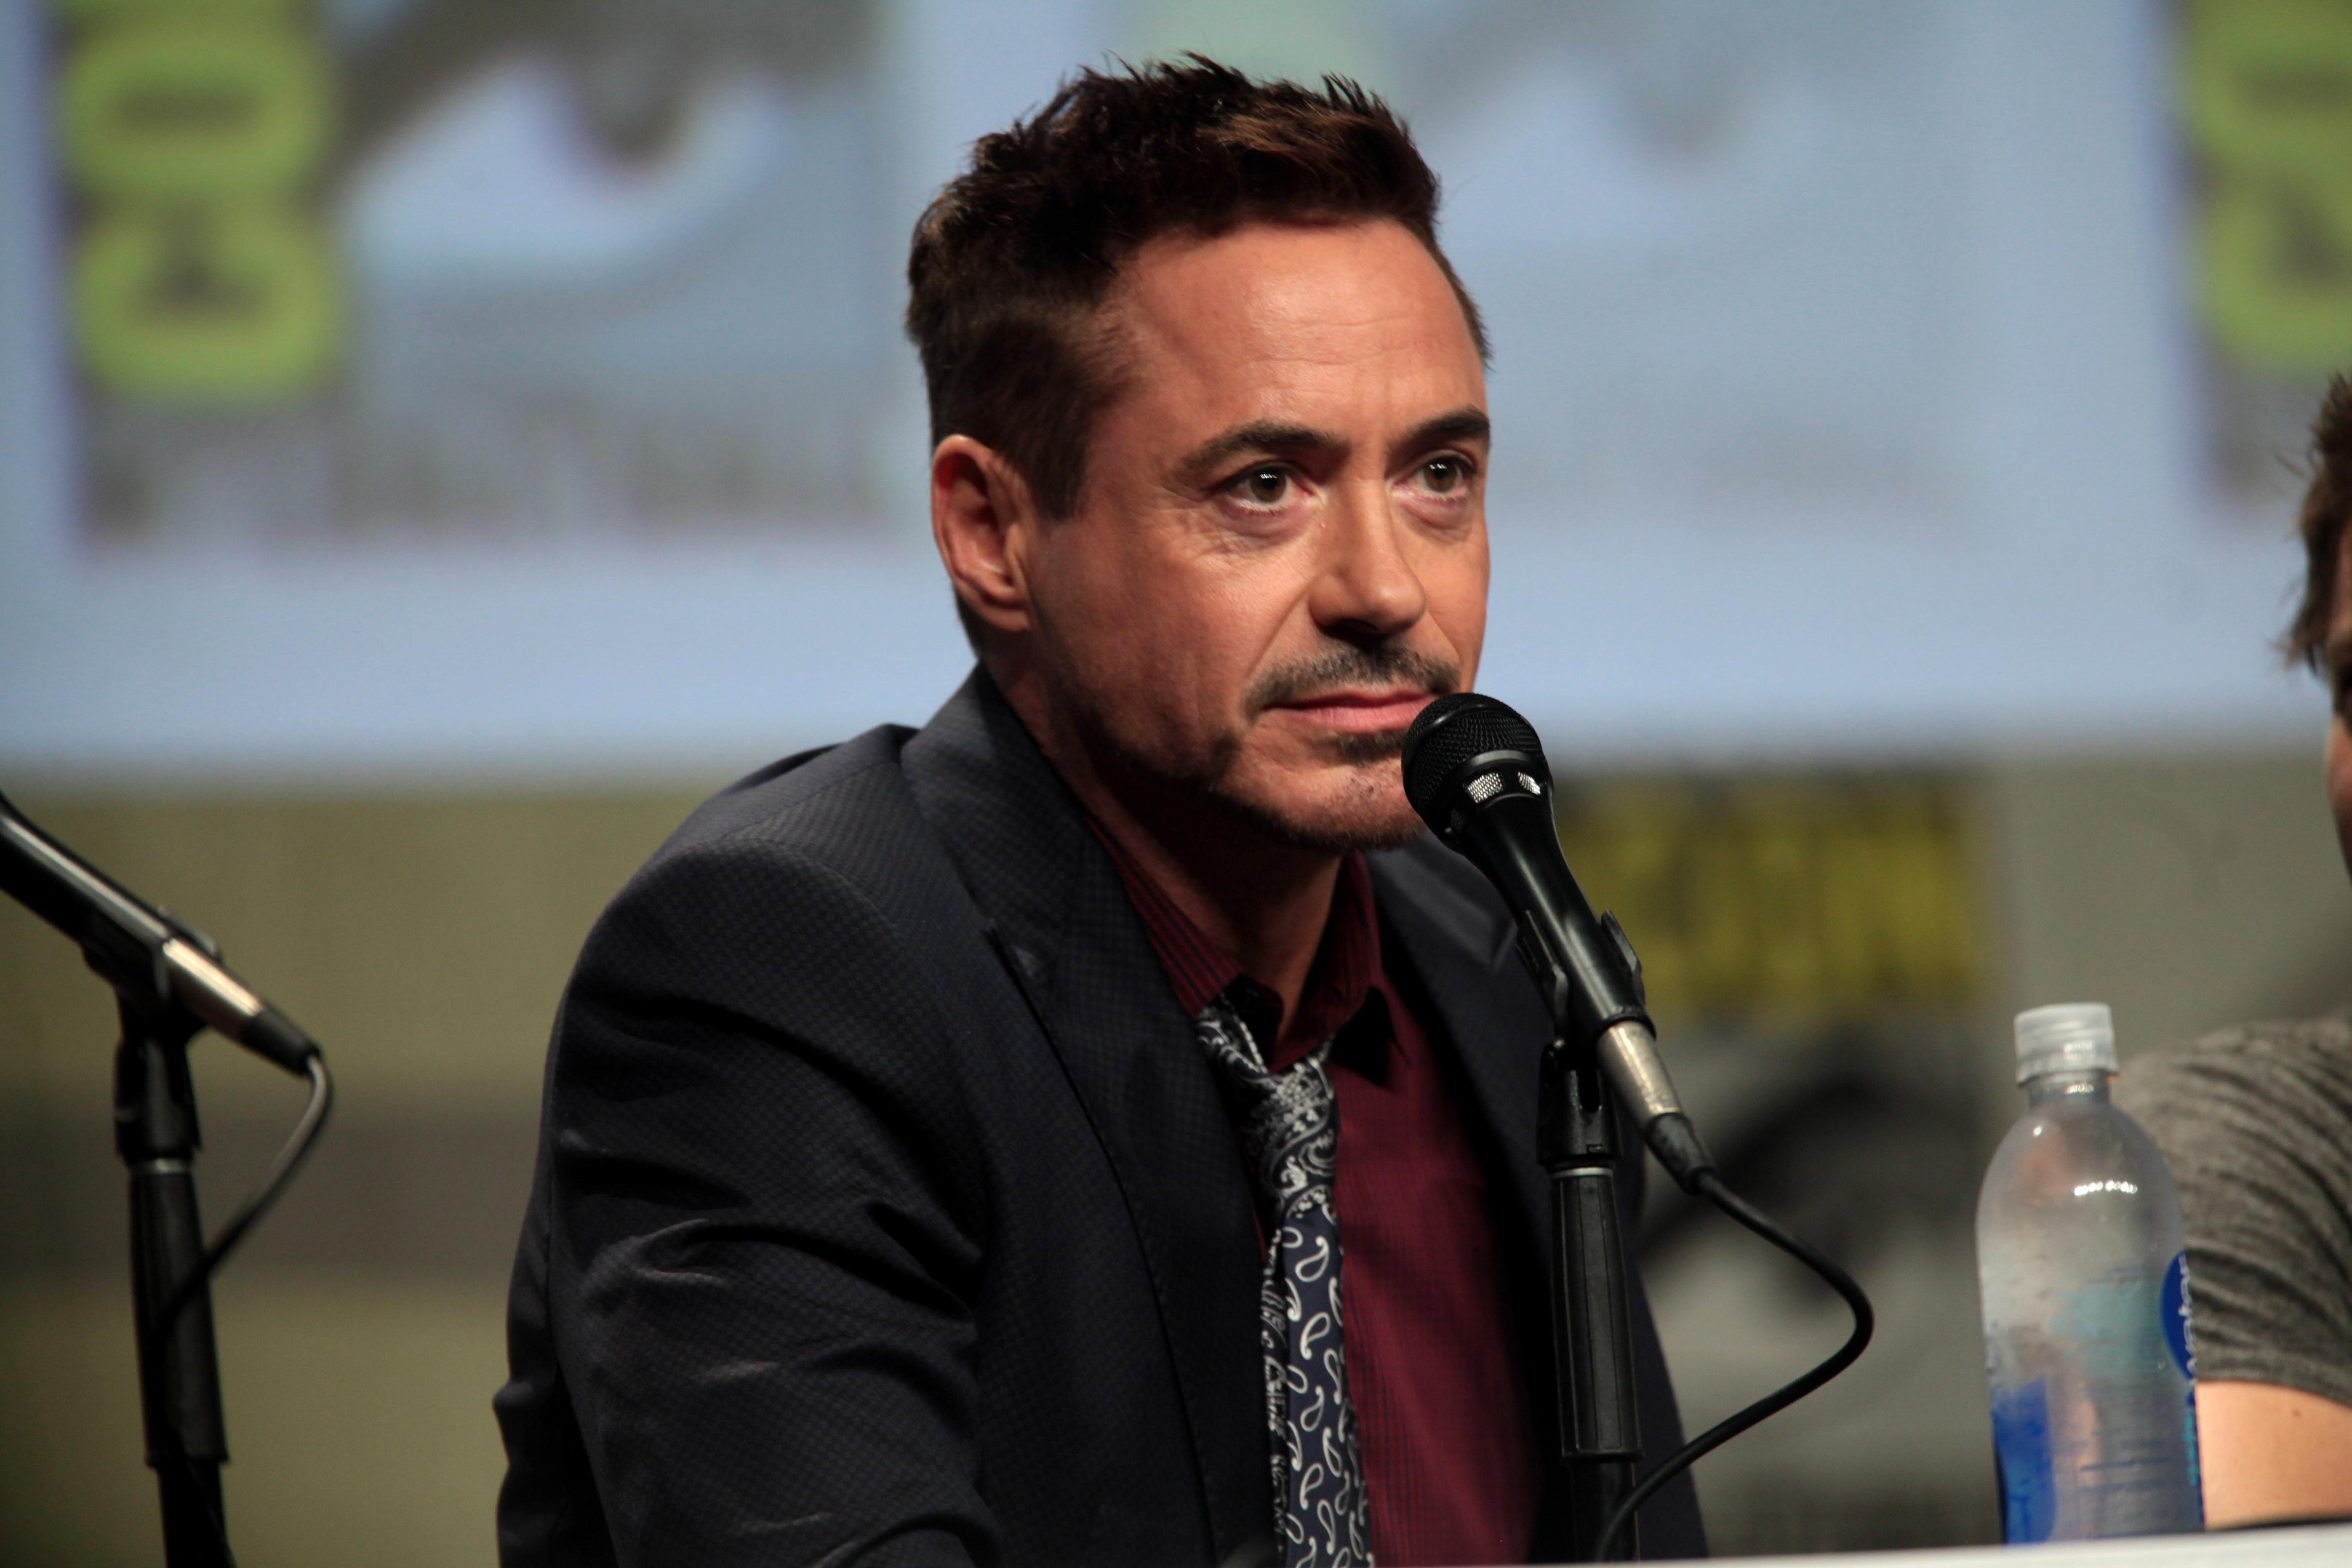 Description Robert Downey Jr 2014 Comic Con.jpg Robert Downey